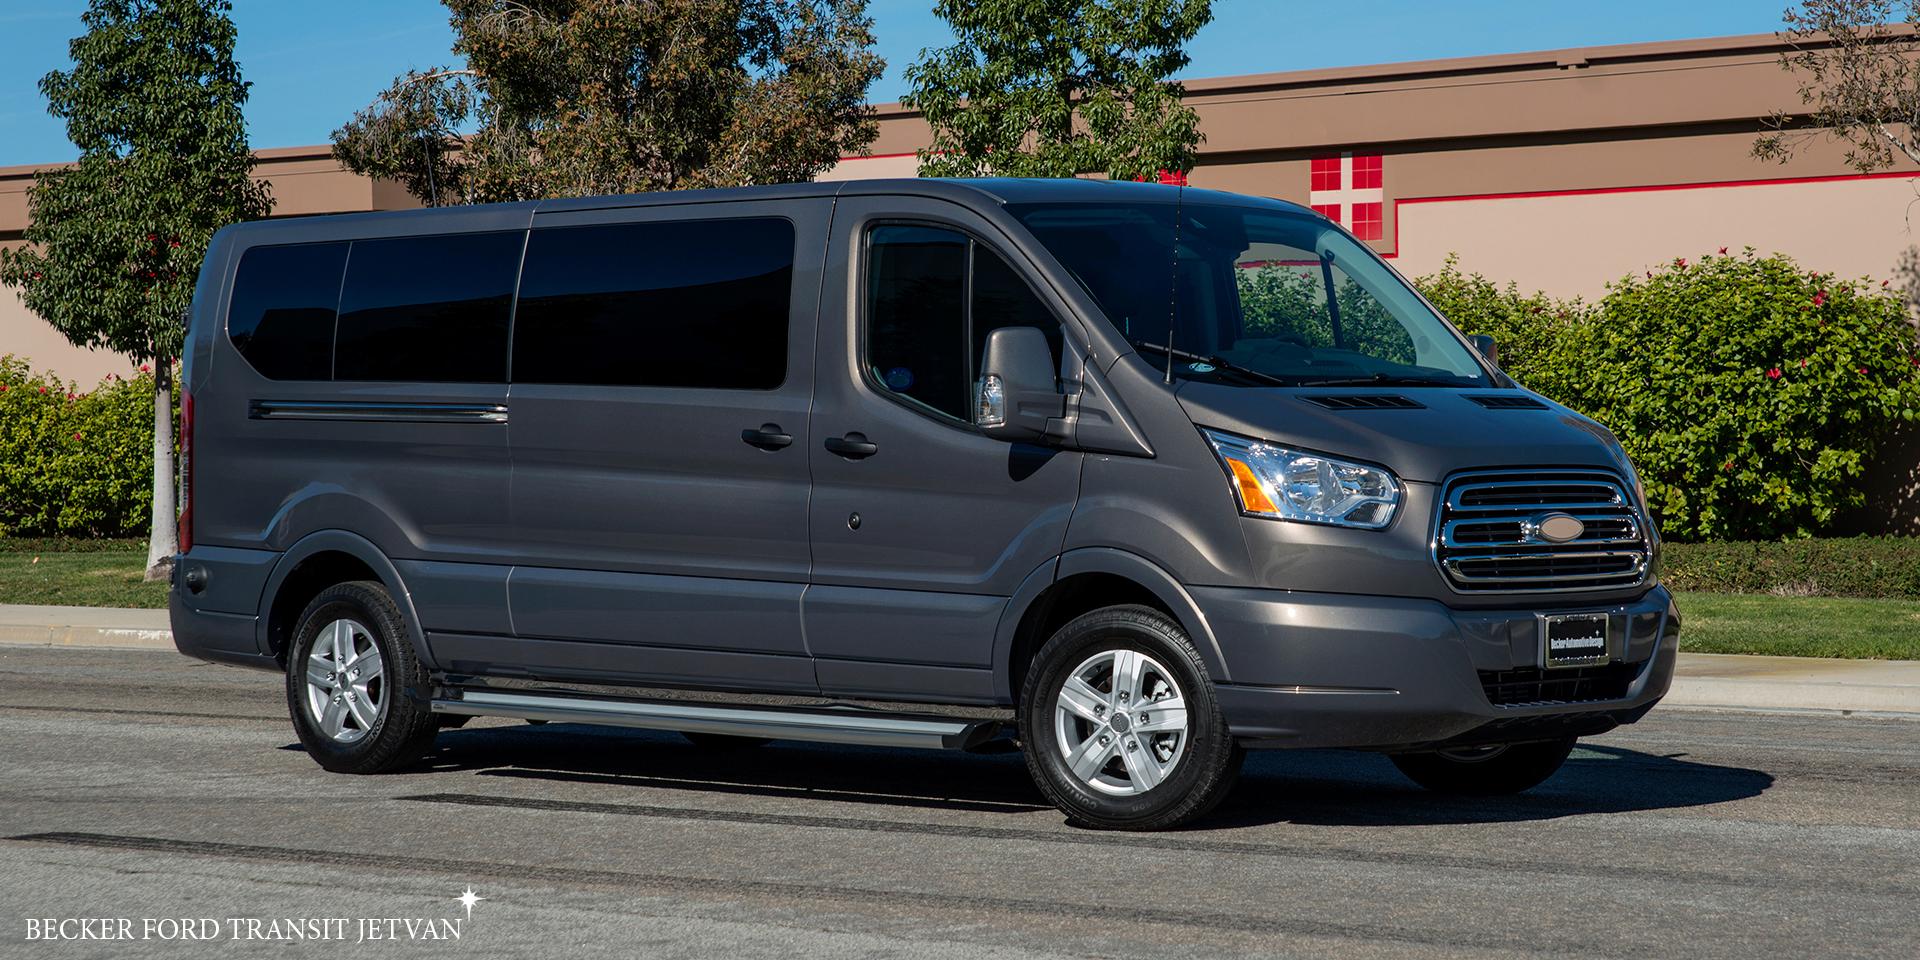 Ford transit jetvan